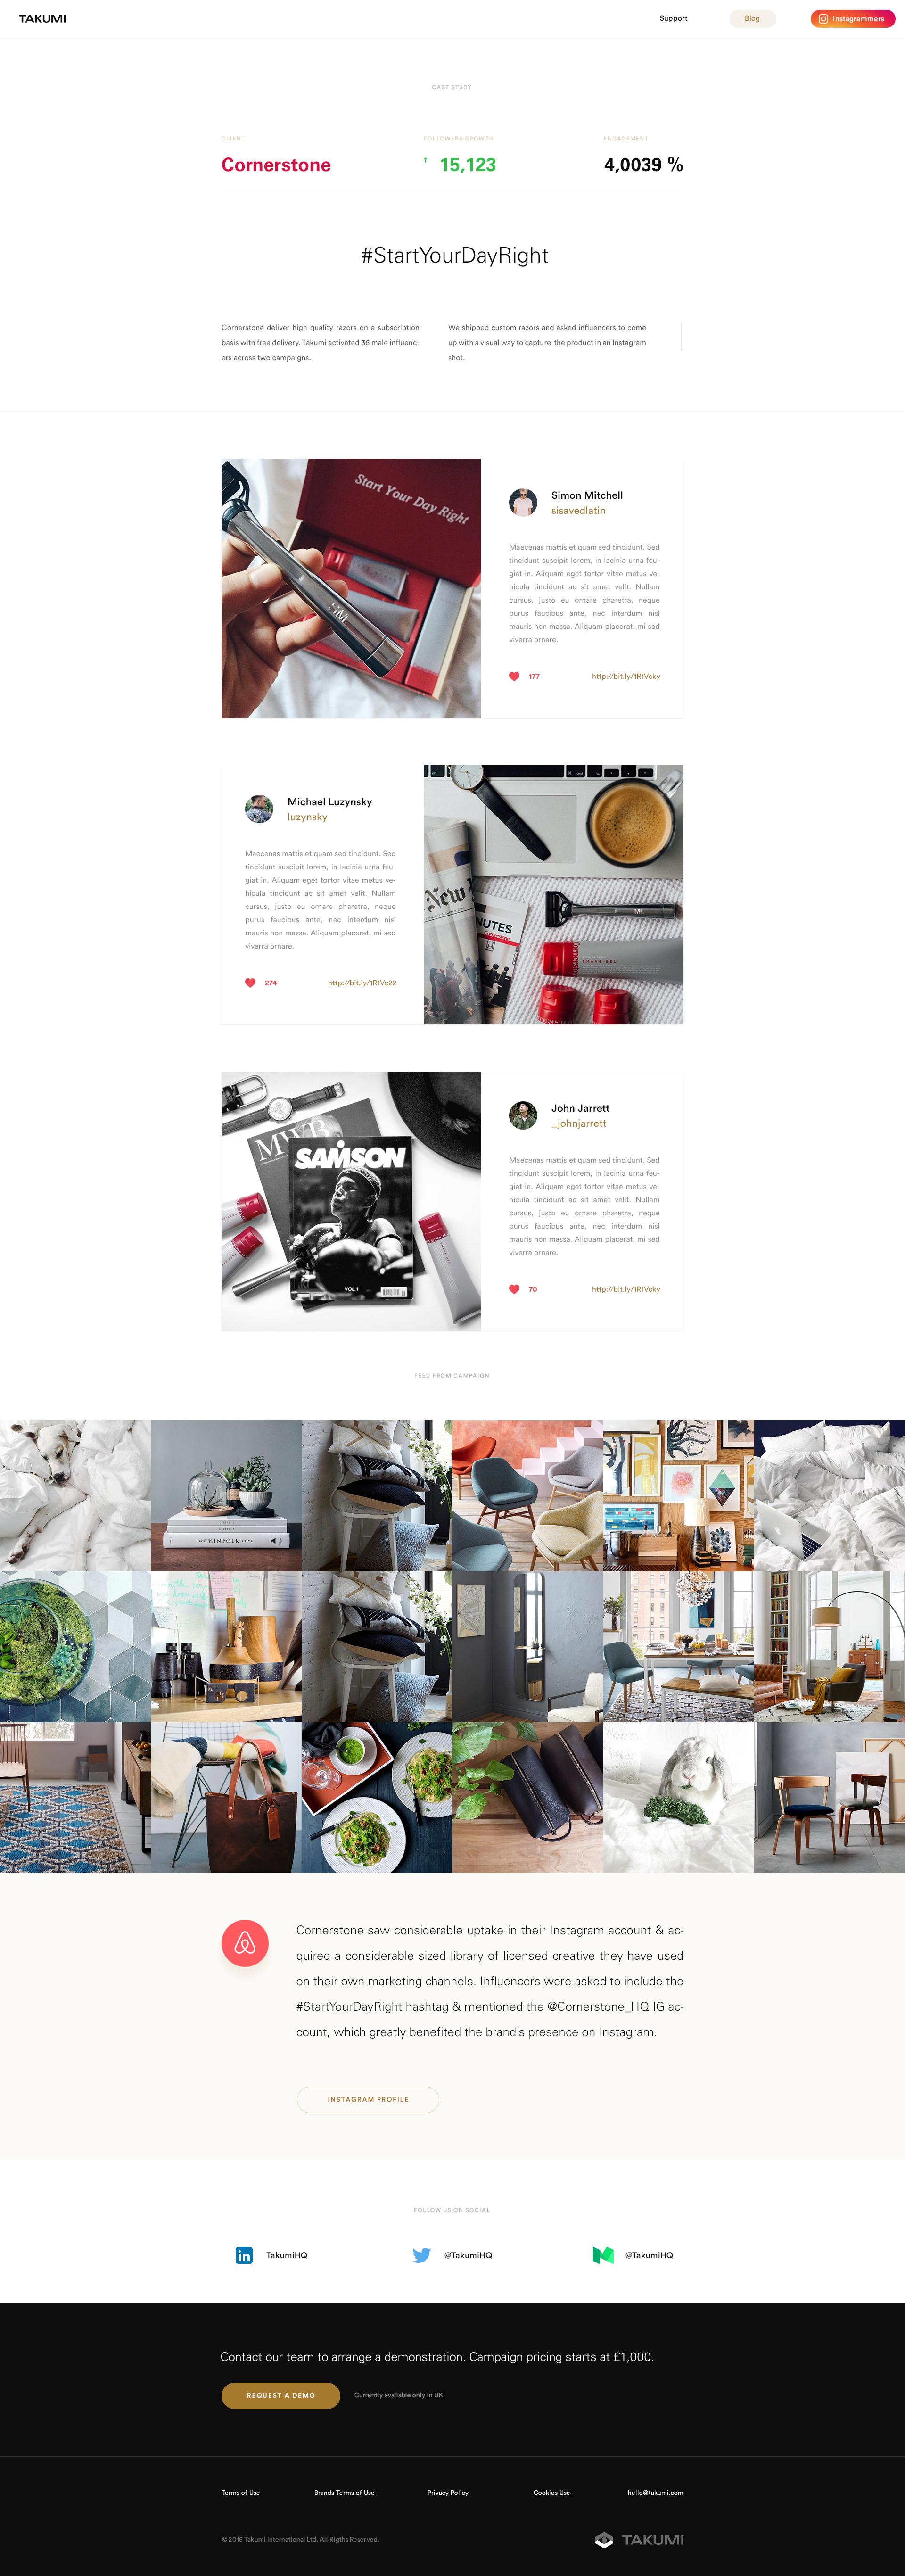 Takumi design case study